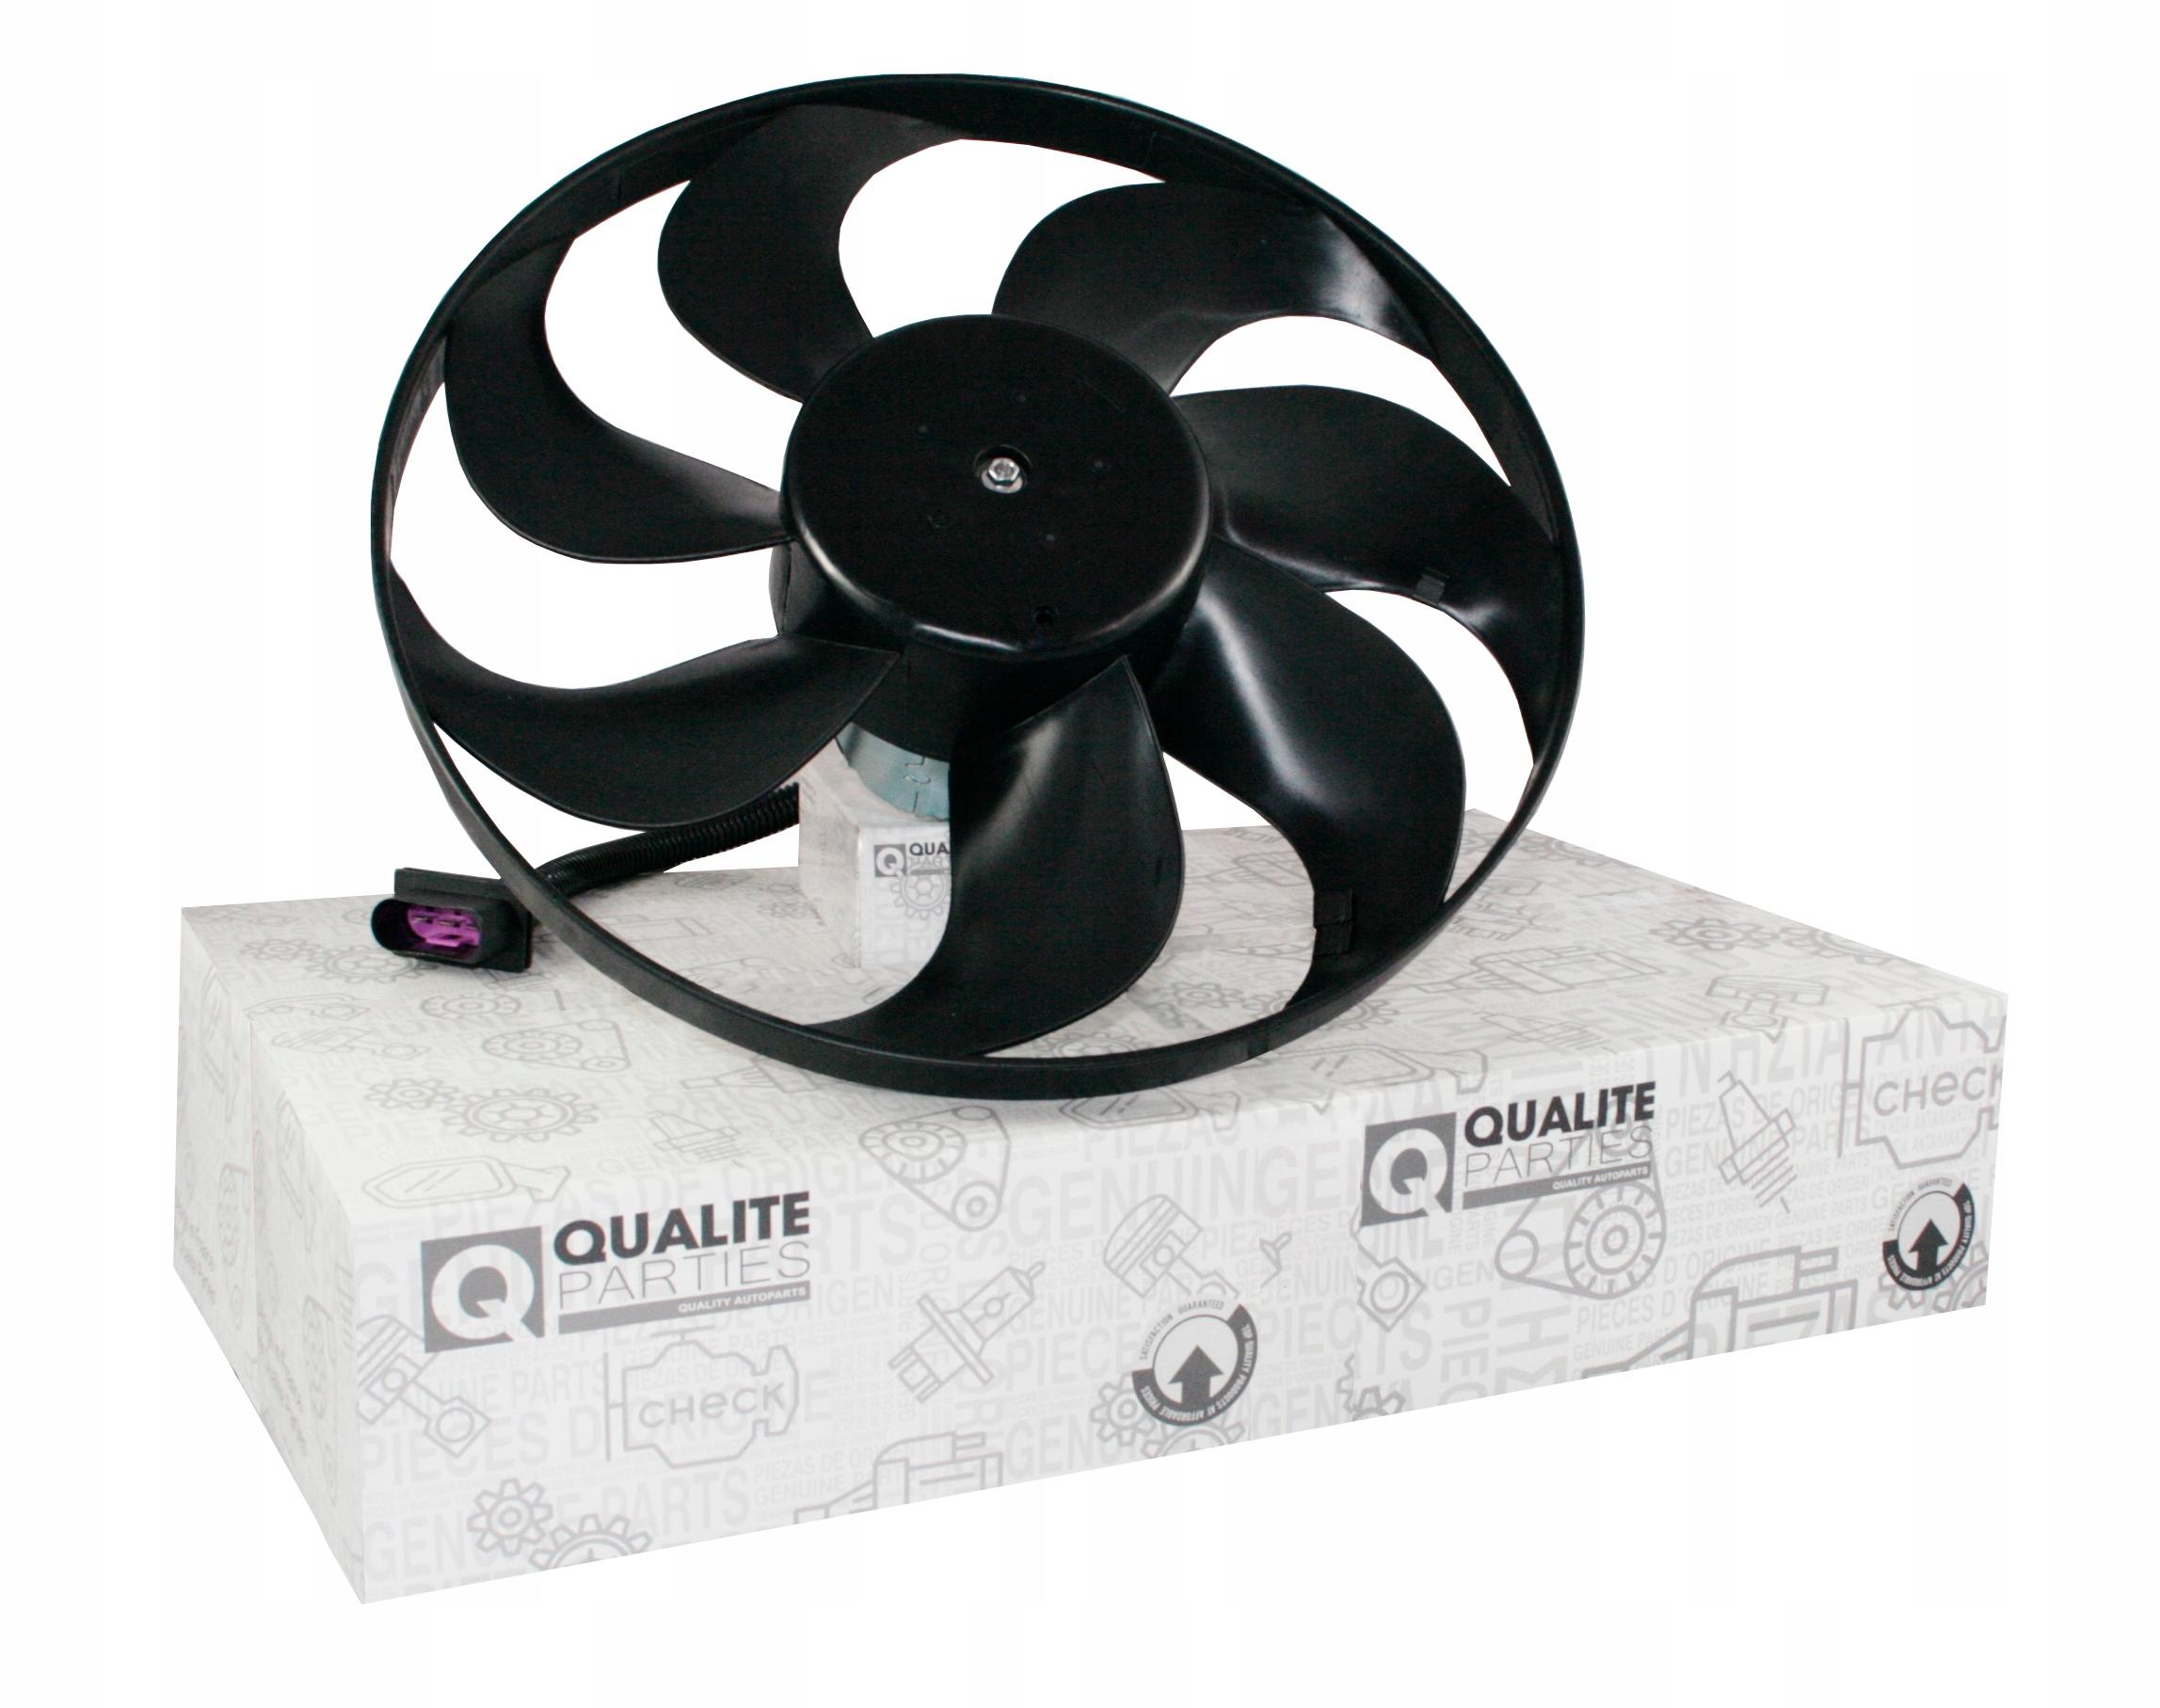 вентилятор кондиционирования воздуха vw lupo поло seat cordoba